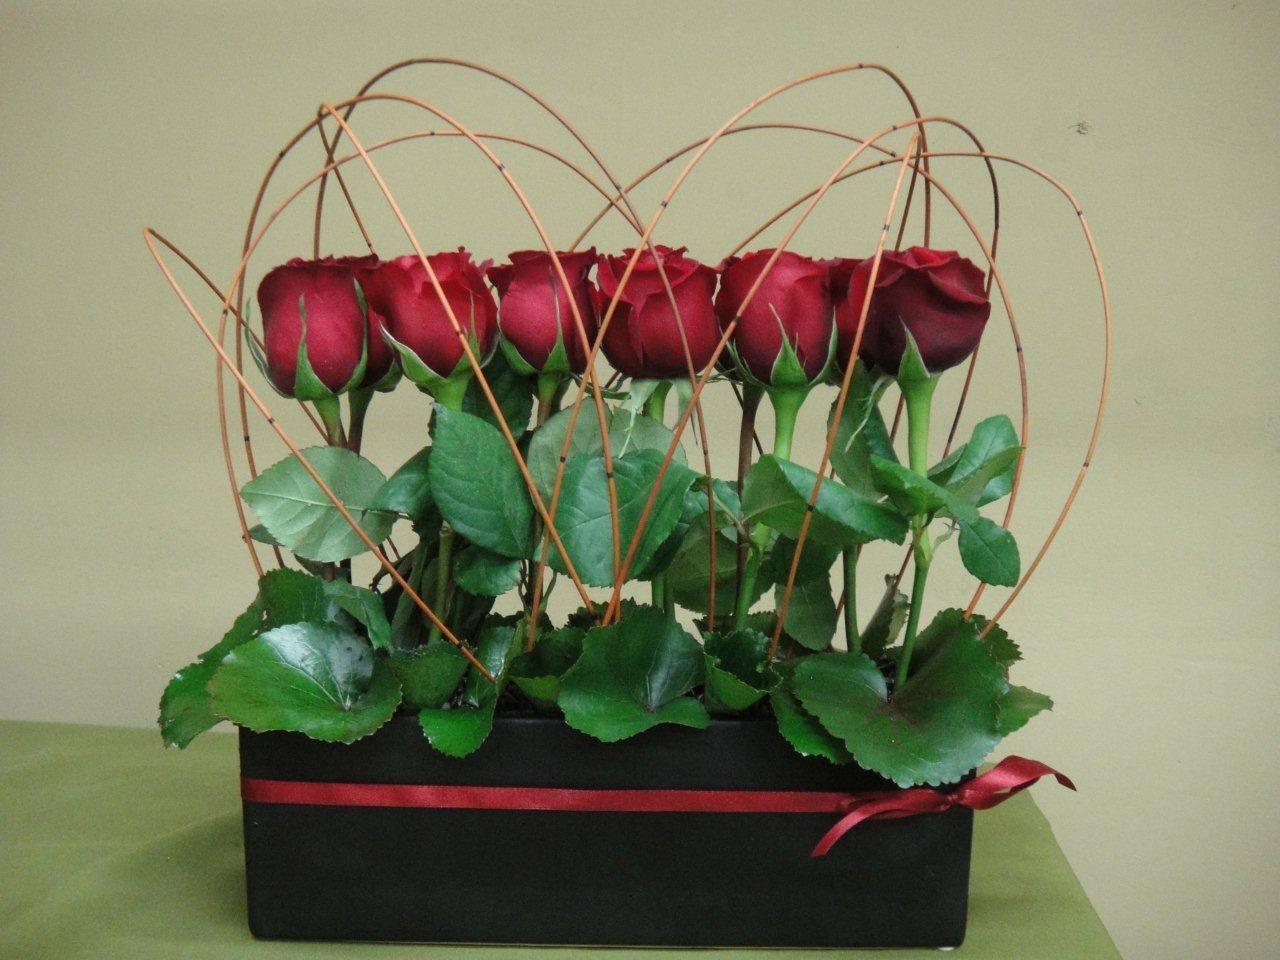 Foliages artificial plants u flowers making llc foliagesdubai on